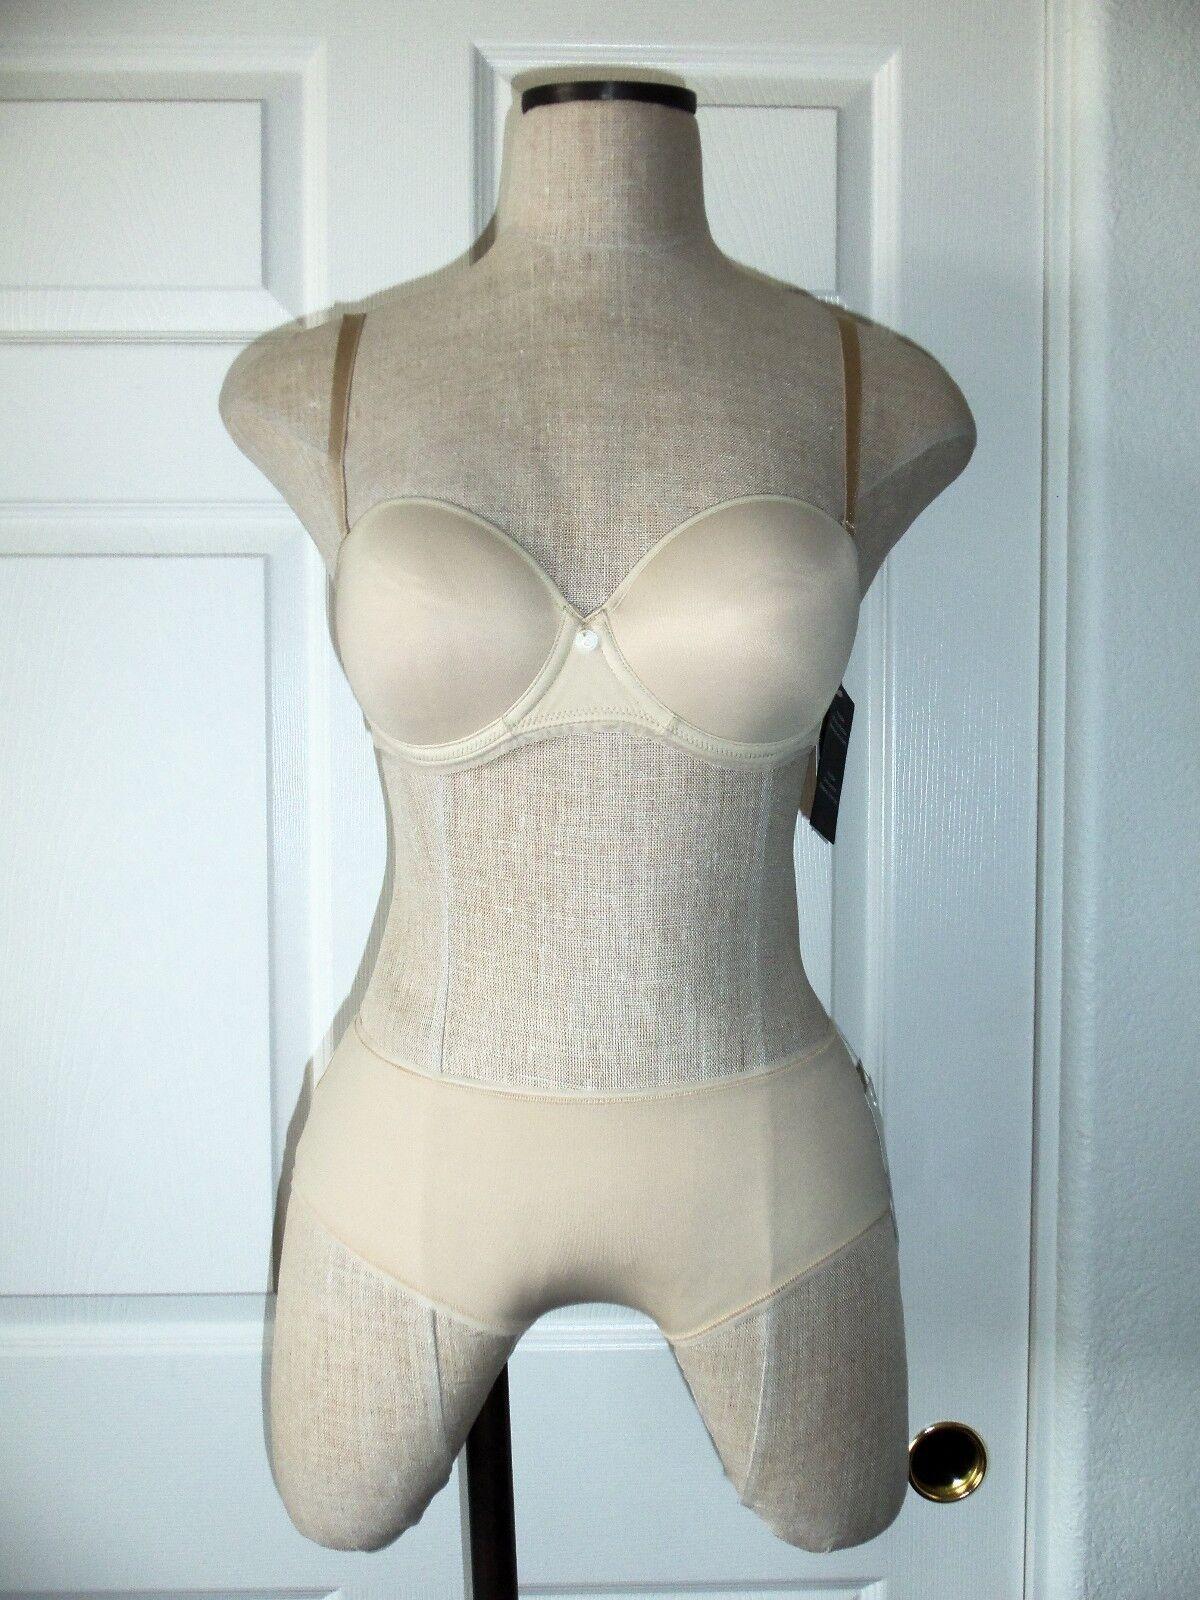 Chantelle SENSUA Beige Nude 3065 Congreenible Strapless Bra 32C & 3064 Shorty XS